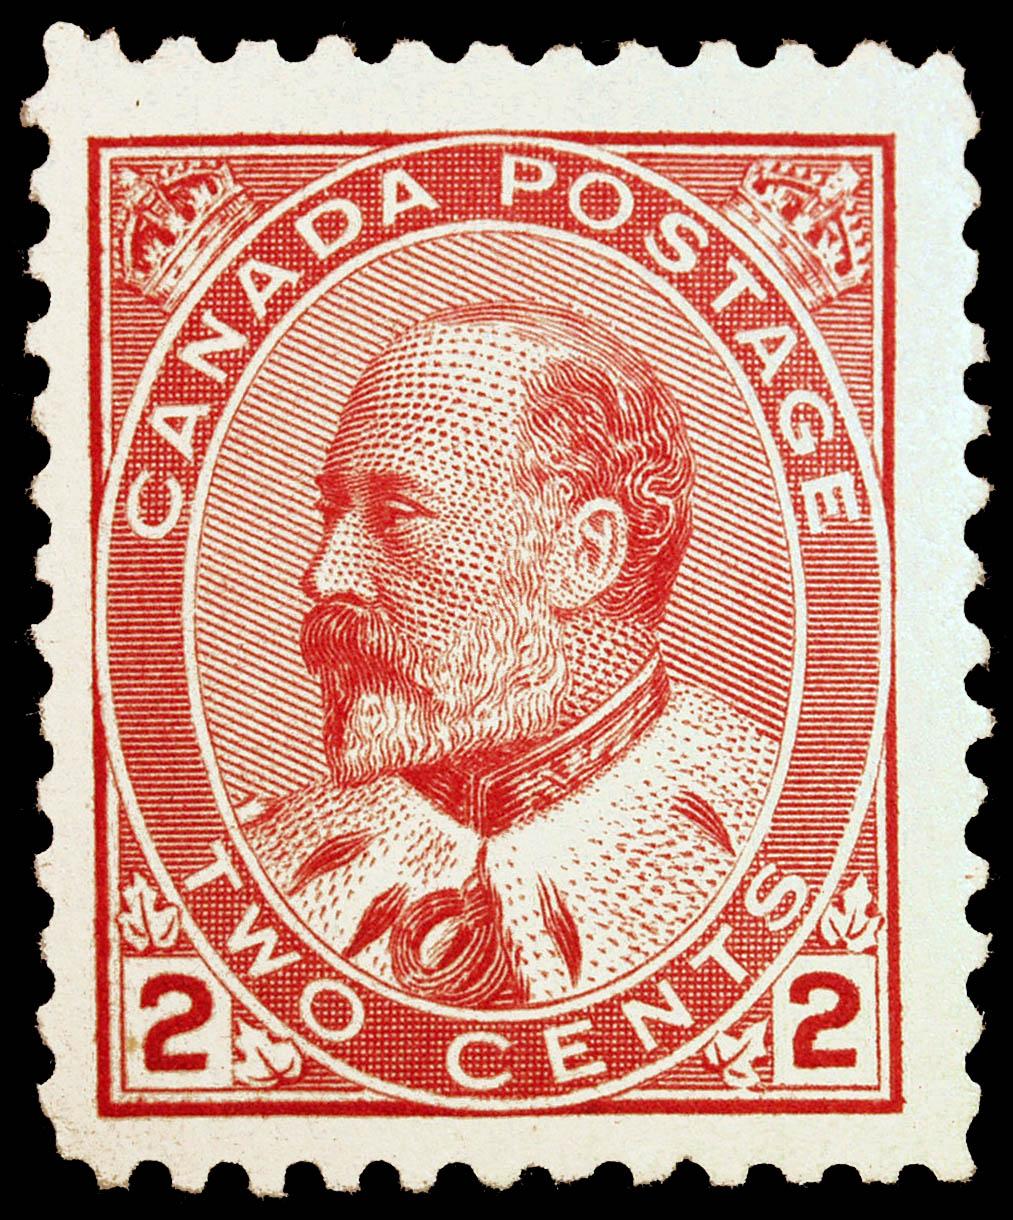 King Edward VII Canada Postage Stamp